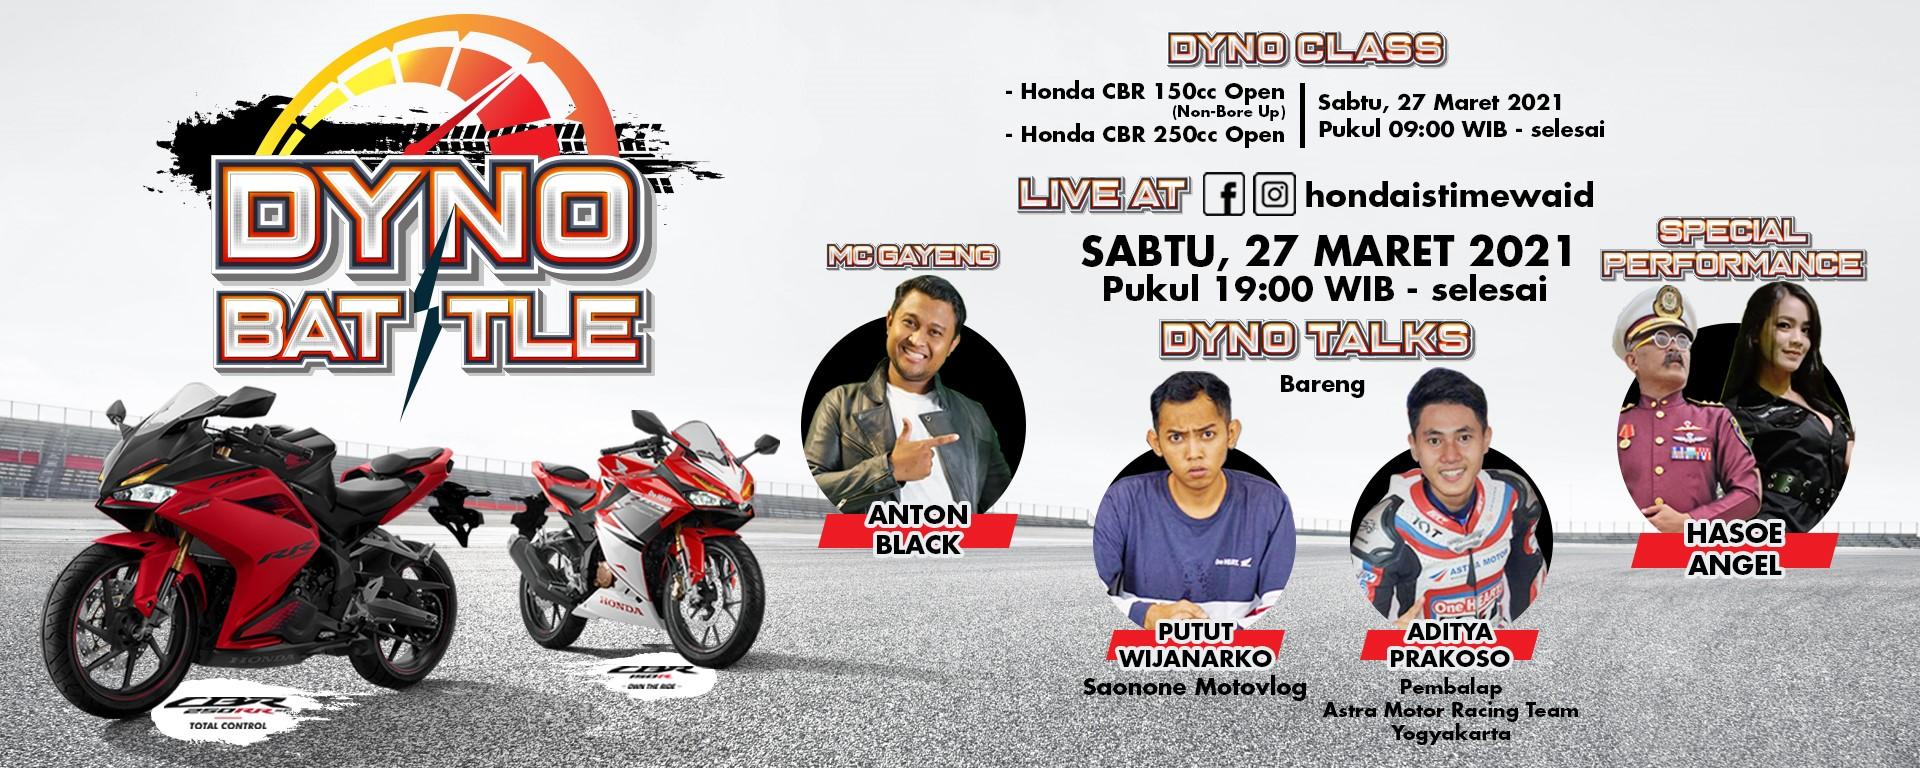 Honda Dyno Battle